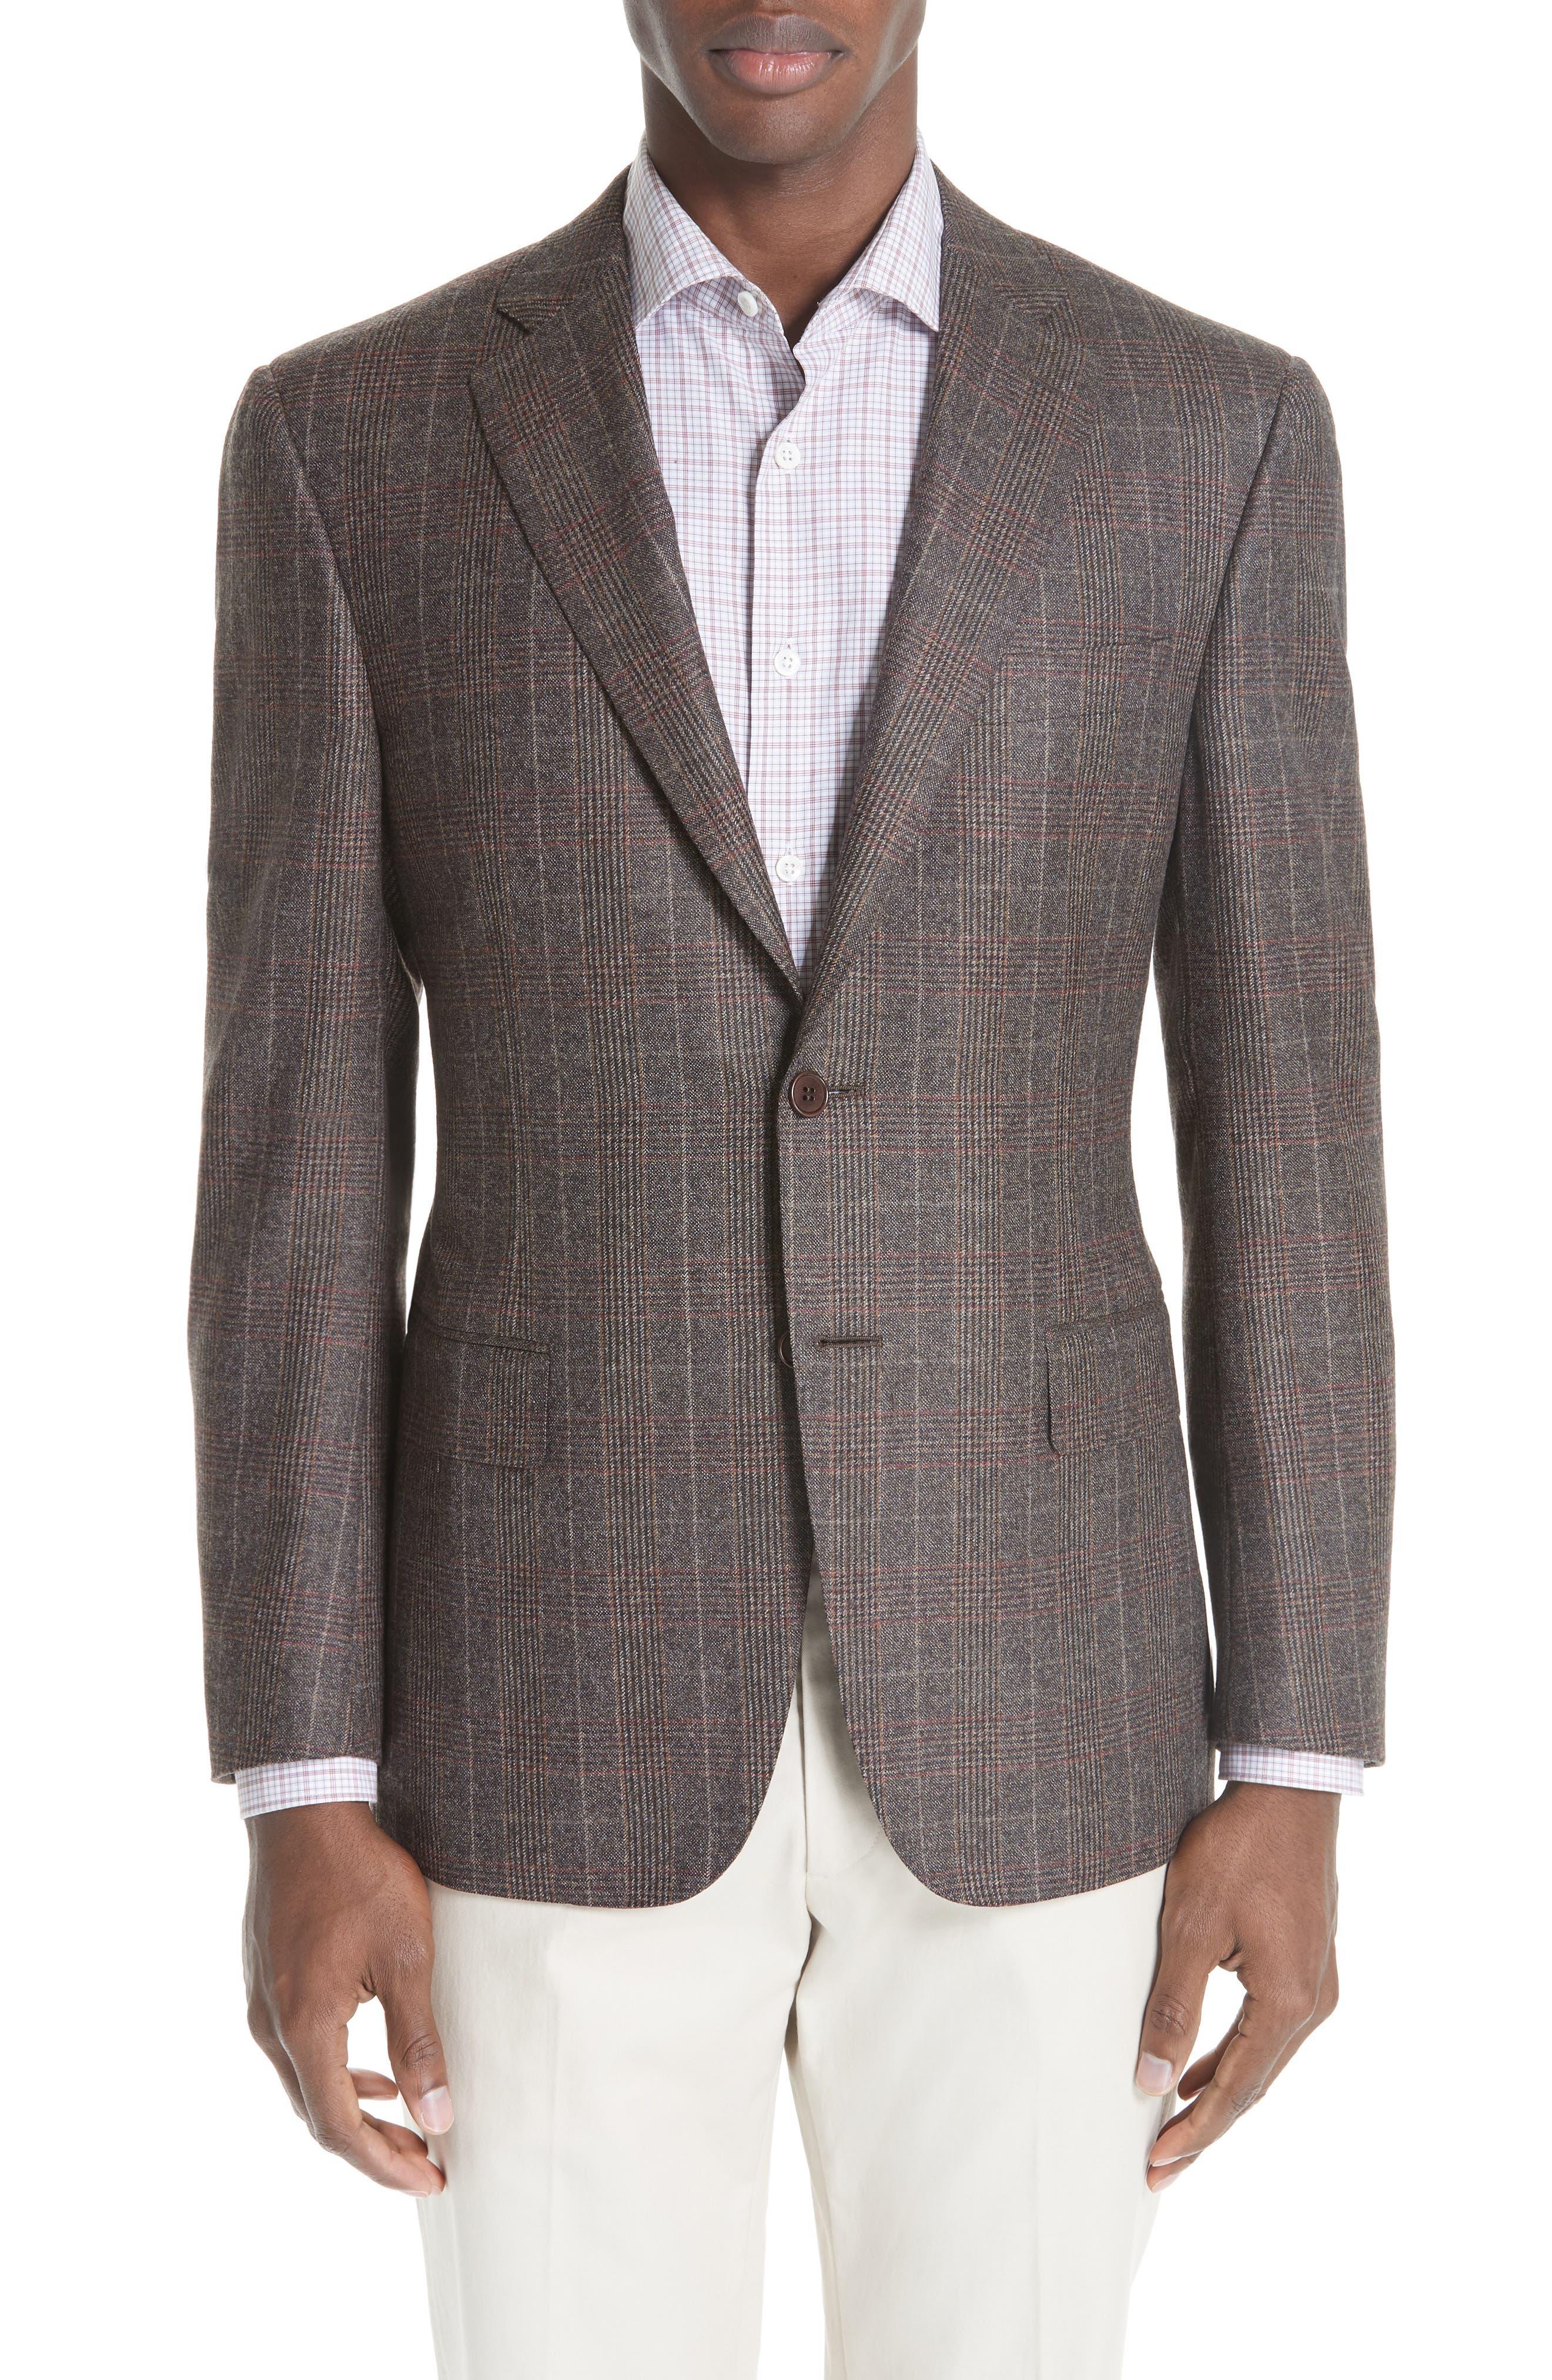 CANALI,                             Classic Fit Plaid Wool Sport Coat,                             Main thumbnail 1, color,                             200